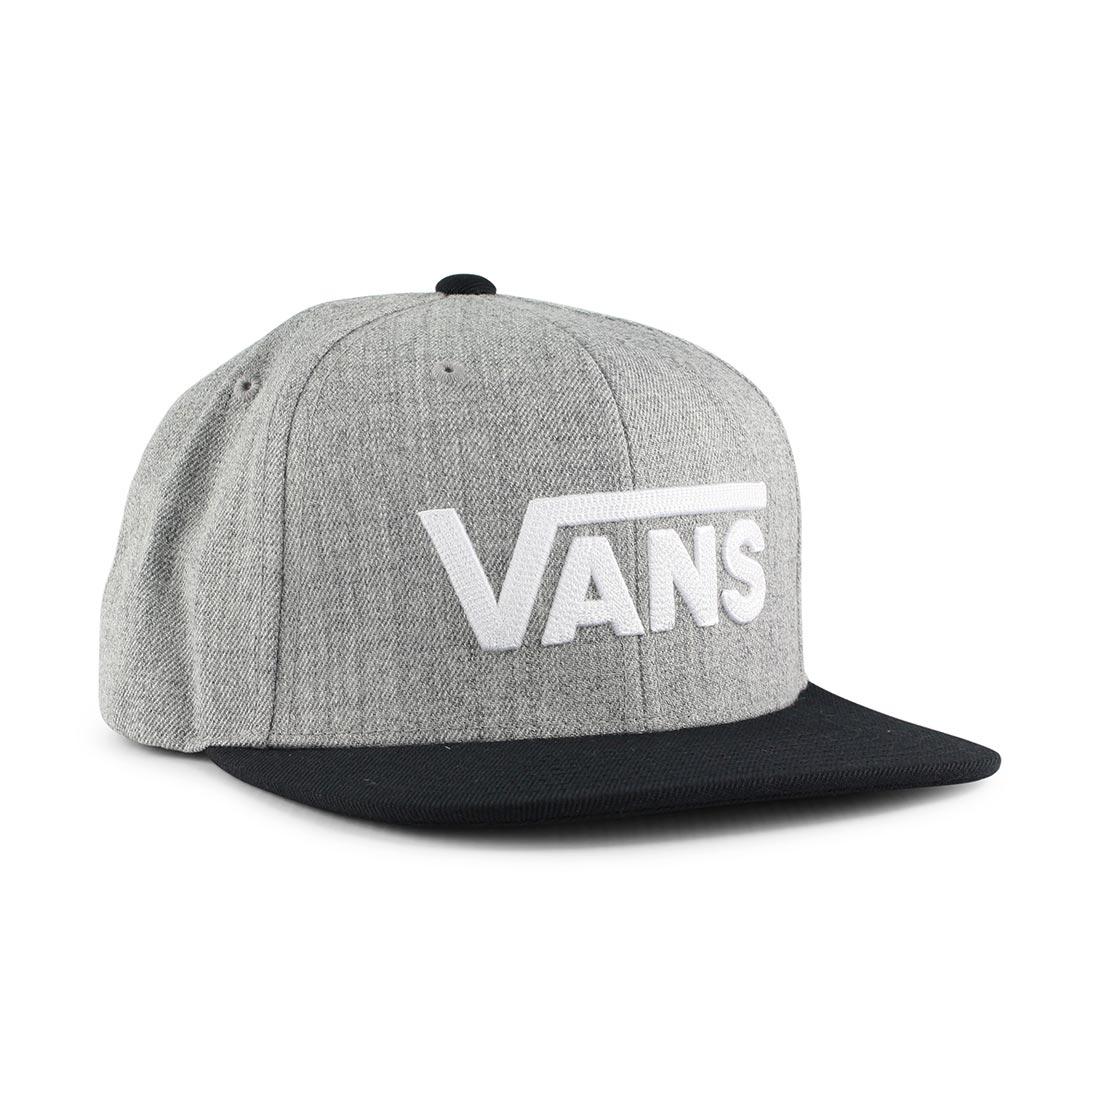 9b4cf8bef Vans Drop V II Snapback Hat - Heather Grey